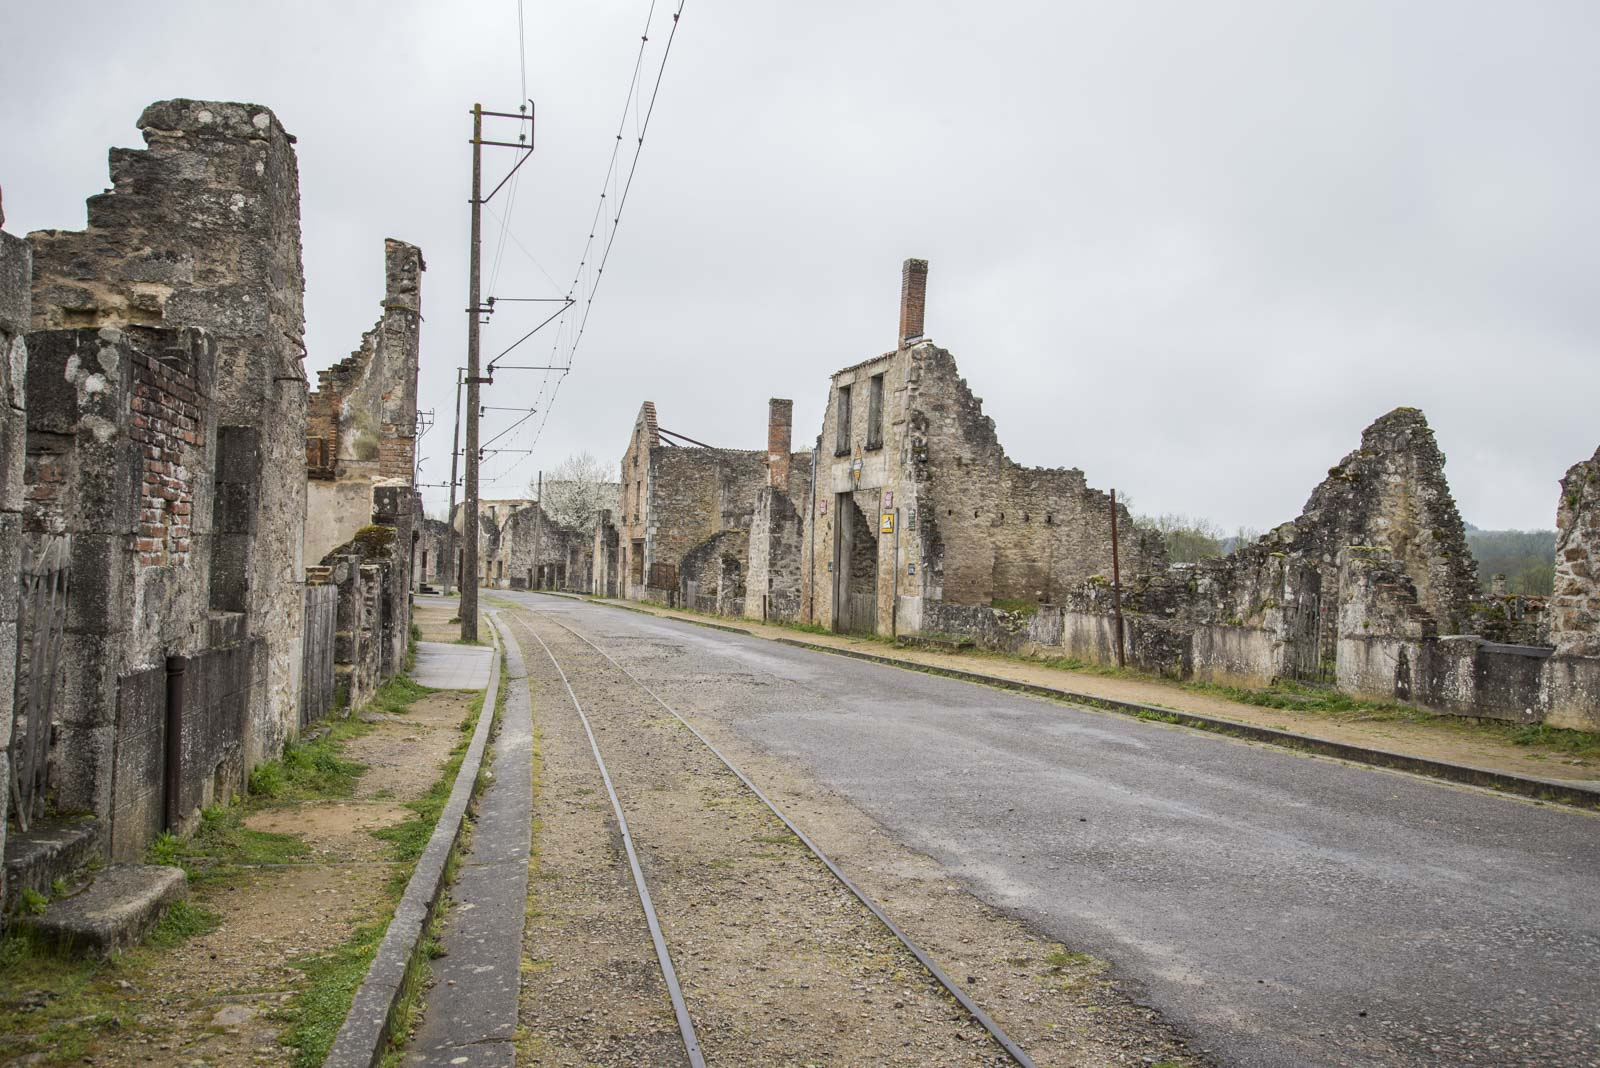 Oradour var en forholdsvis moderne by, med blant annet sporvei